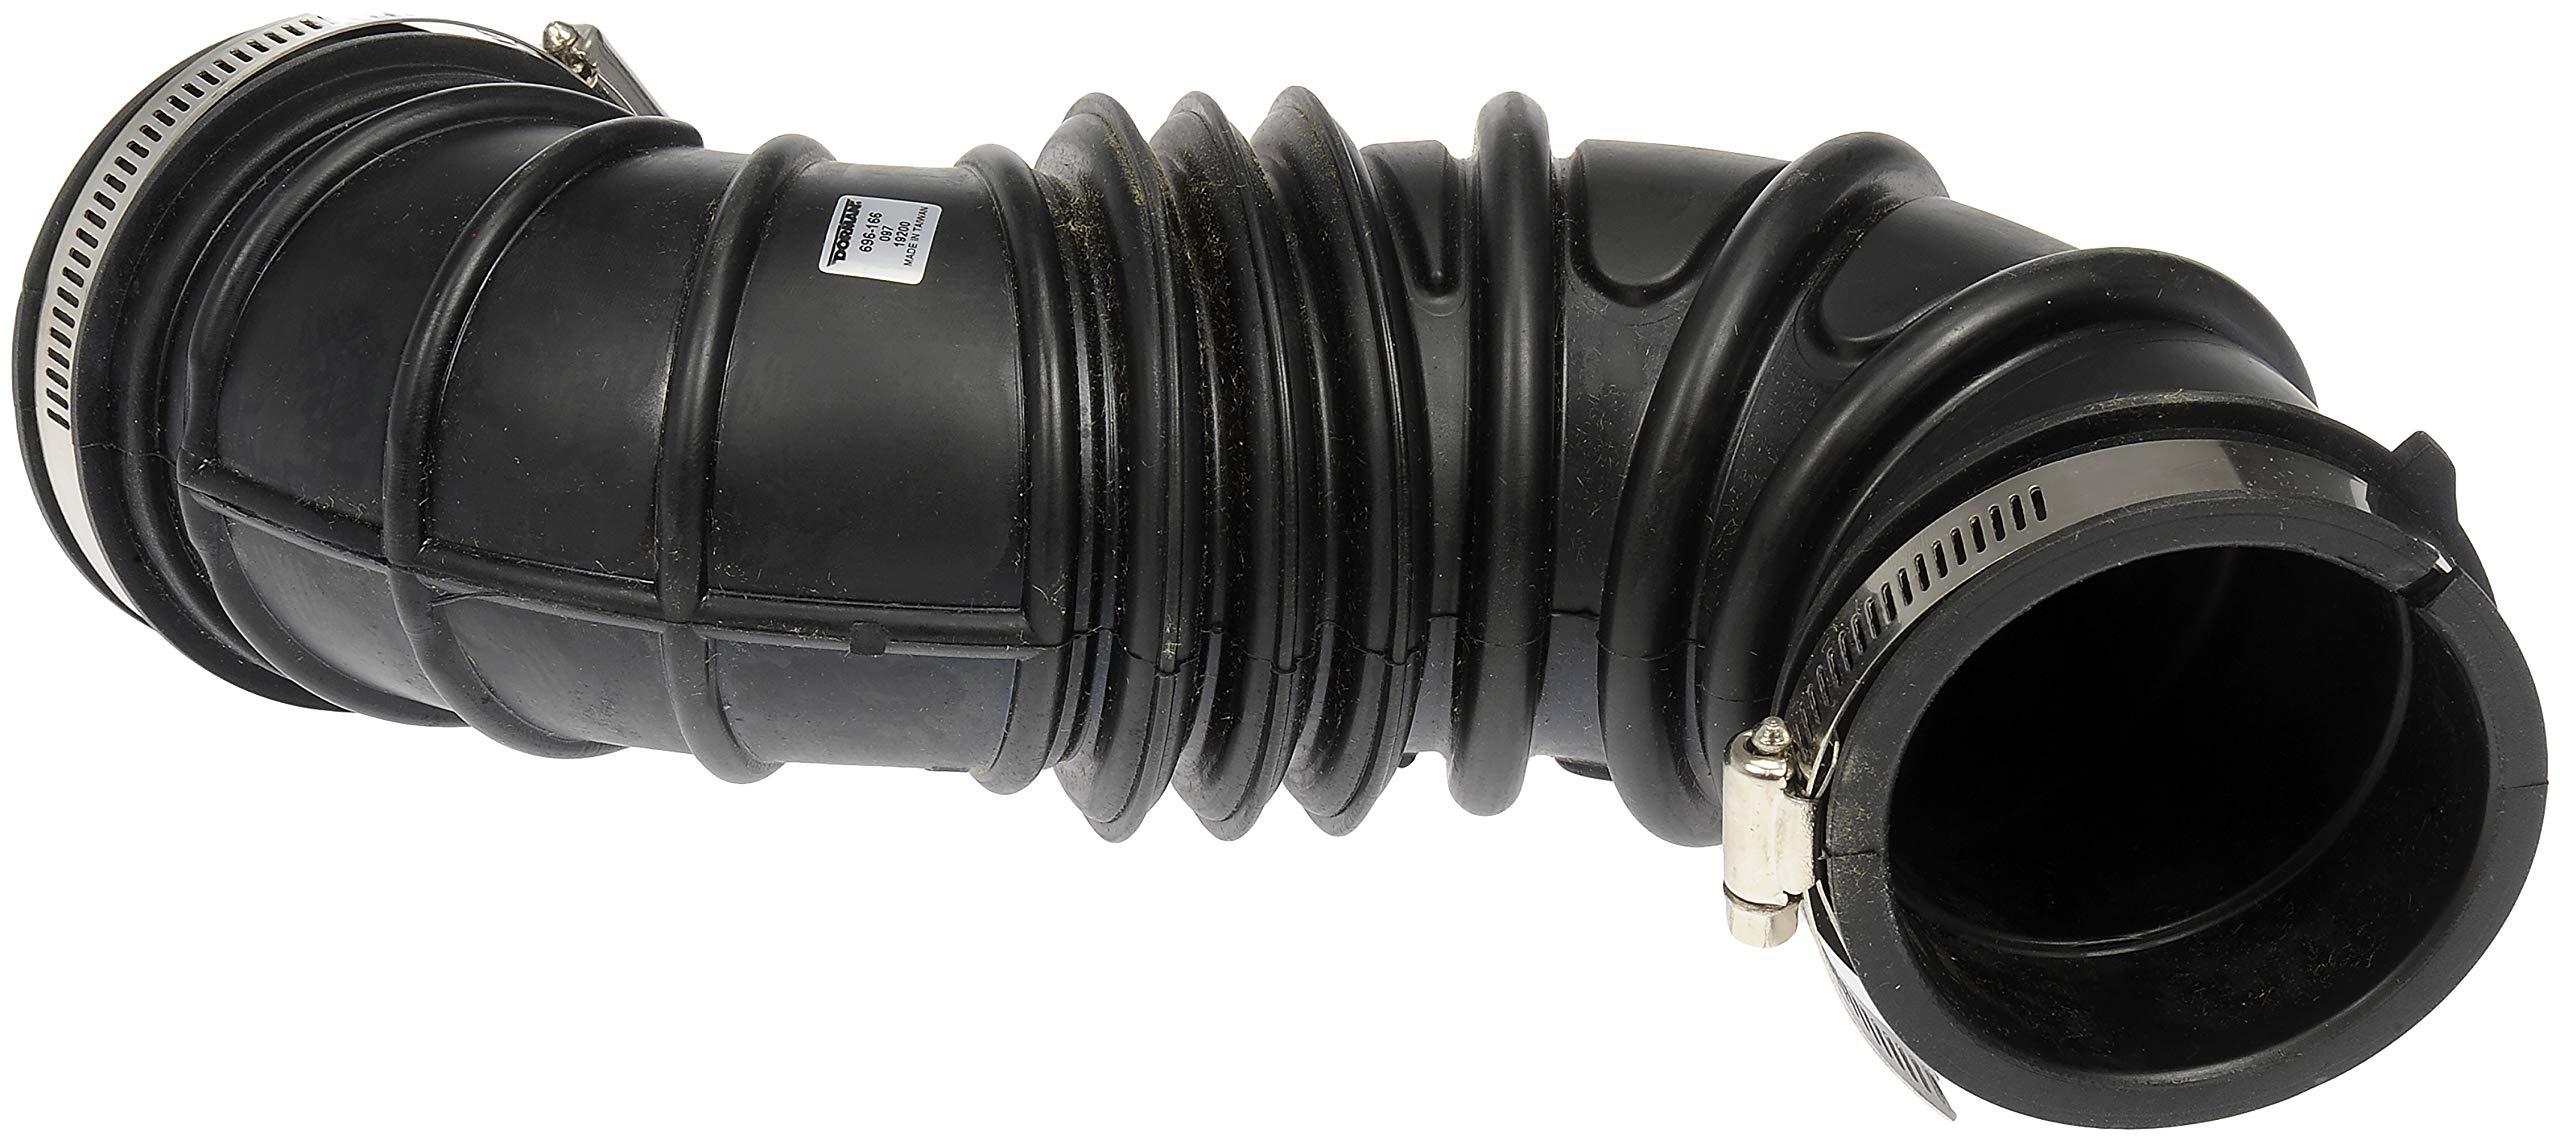 Dorman 696-166 Engine Air Intake Hose for Select Toyota Models